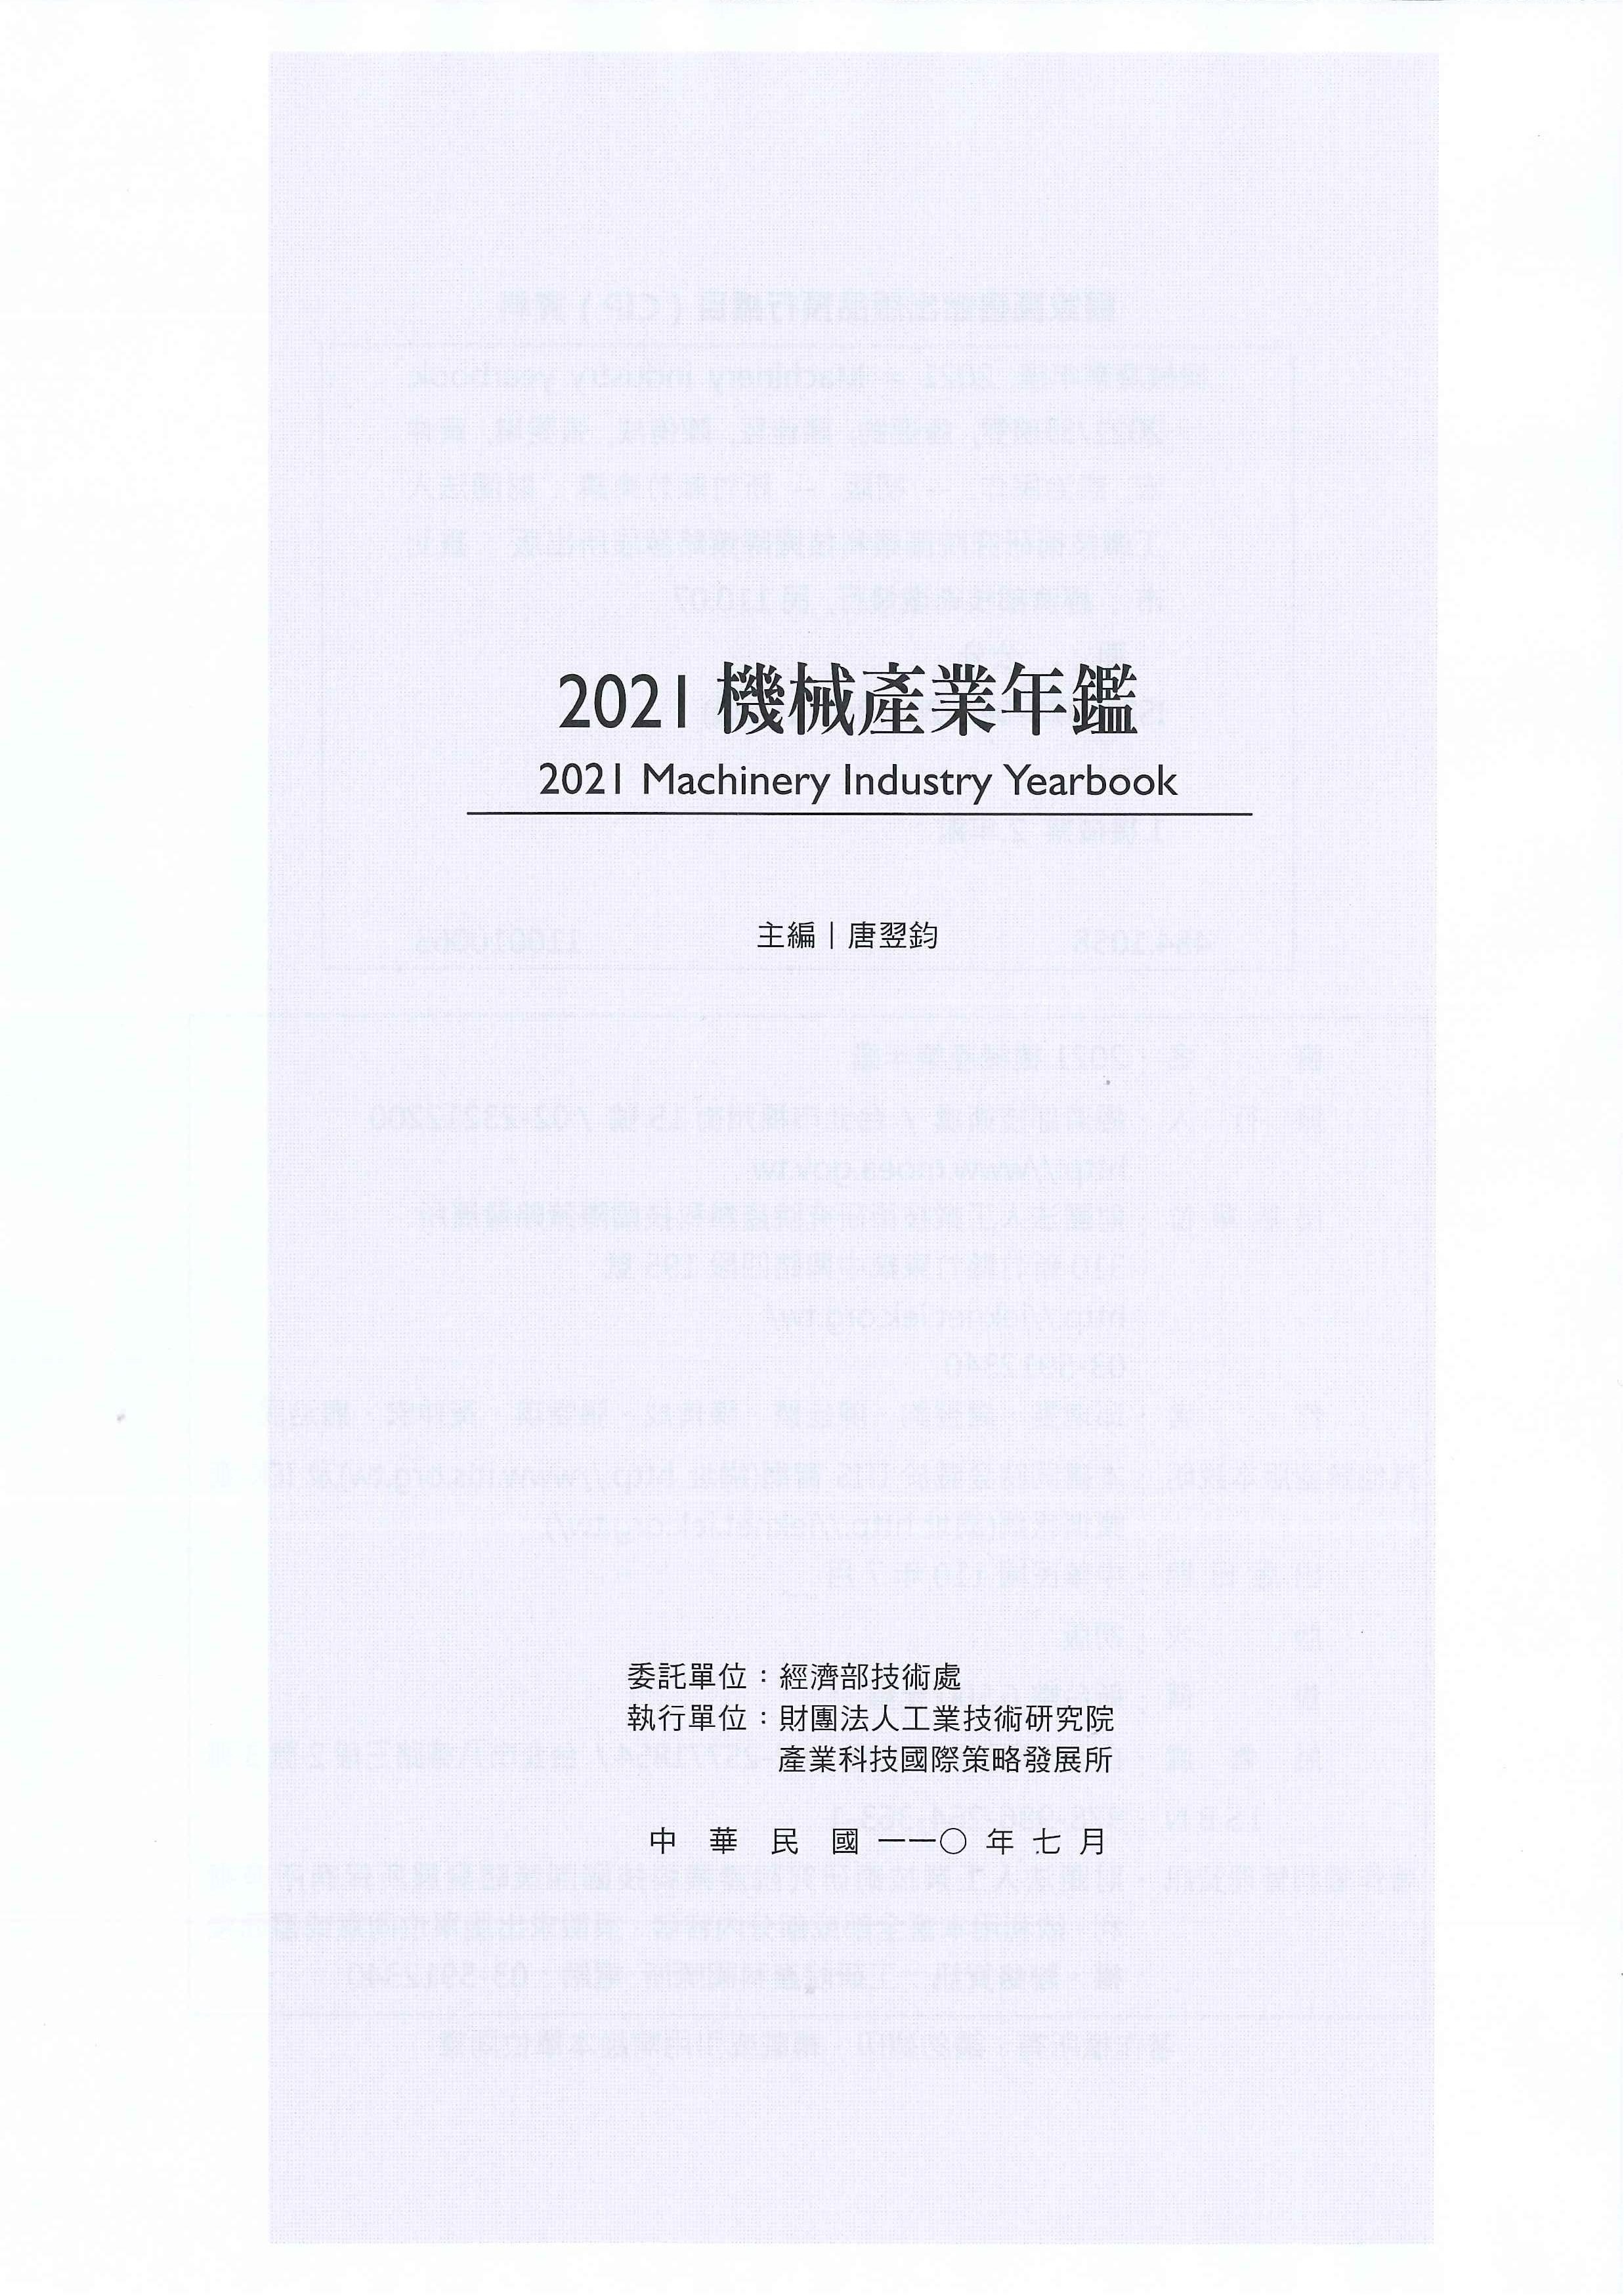 機械產業年鑑=Machinery industry yearbook